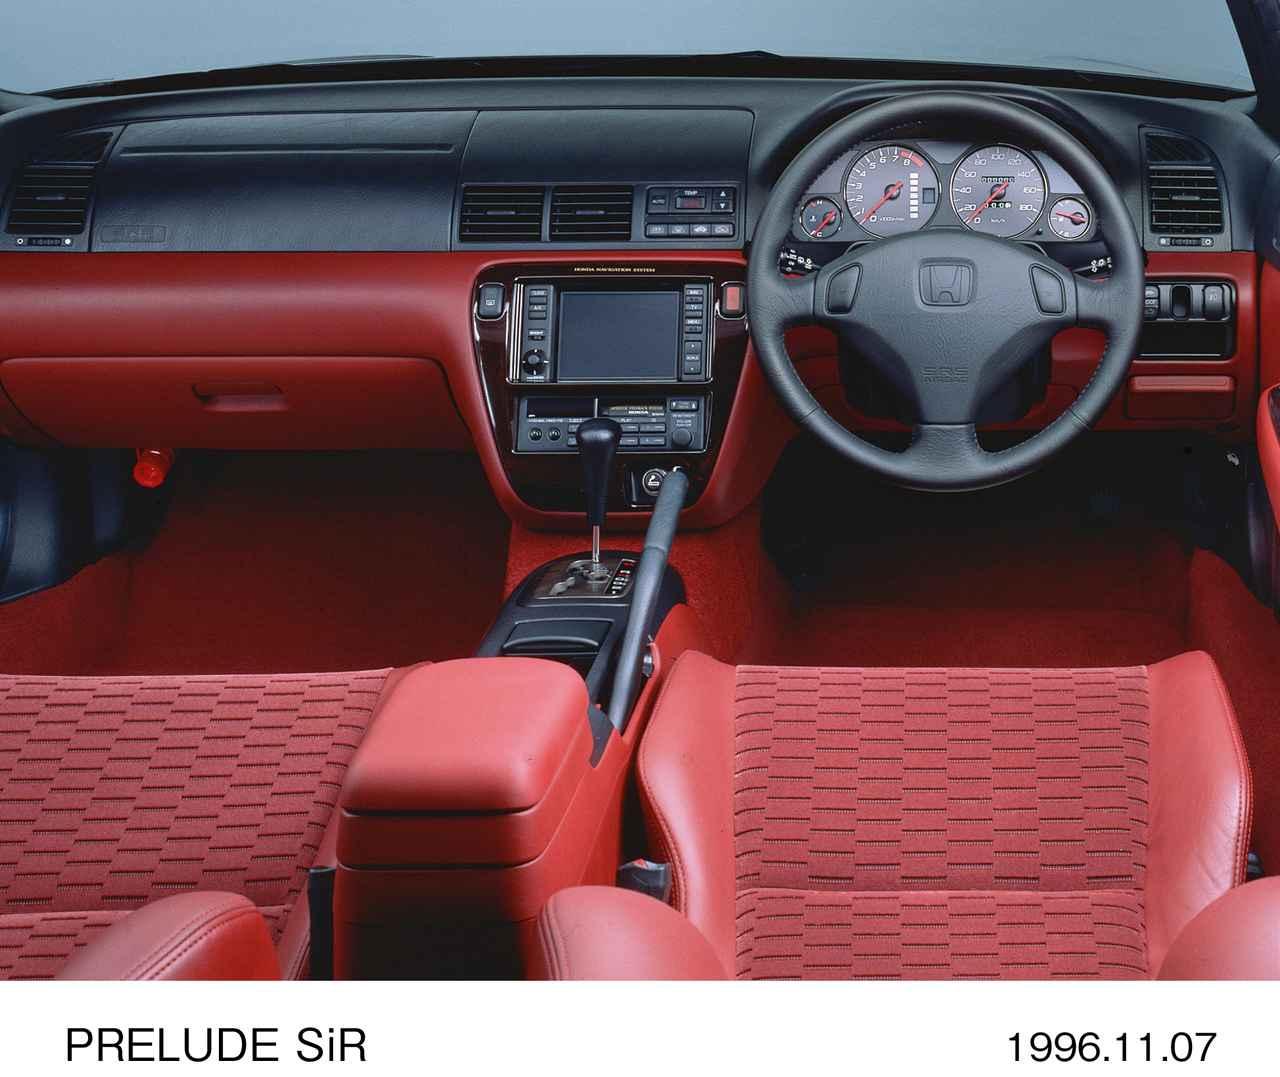 Images : 5番目の画像 - ホンダ プレリュード関連画像(クリックして拡大) - A Little Honda   ア・リトル・ホンダ(リトホン)